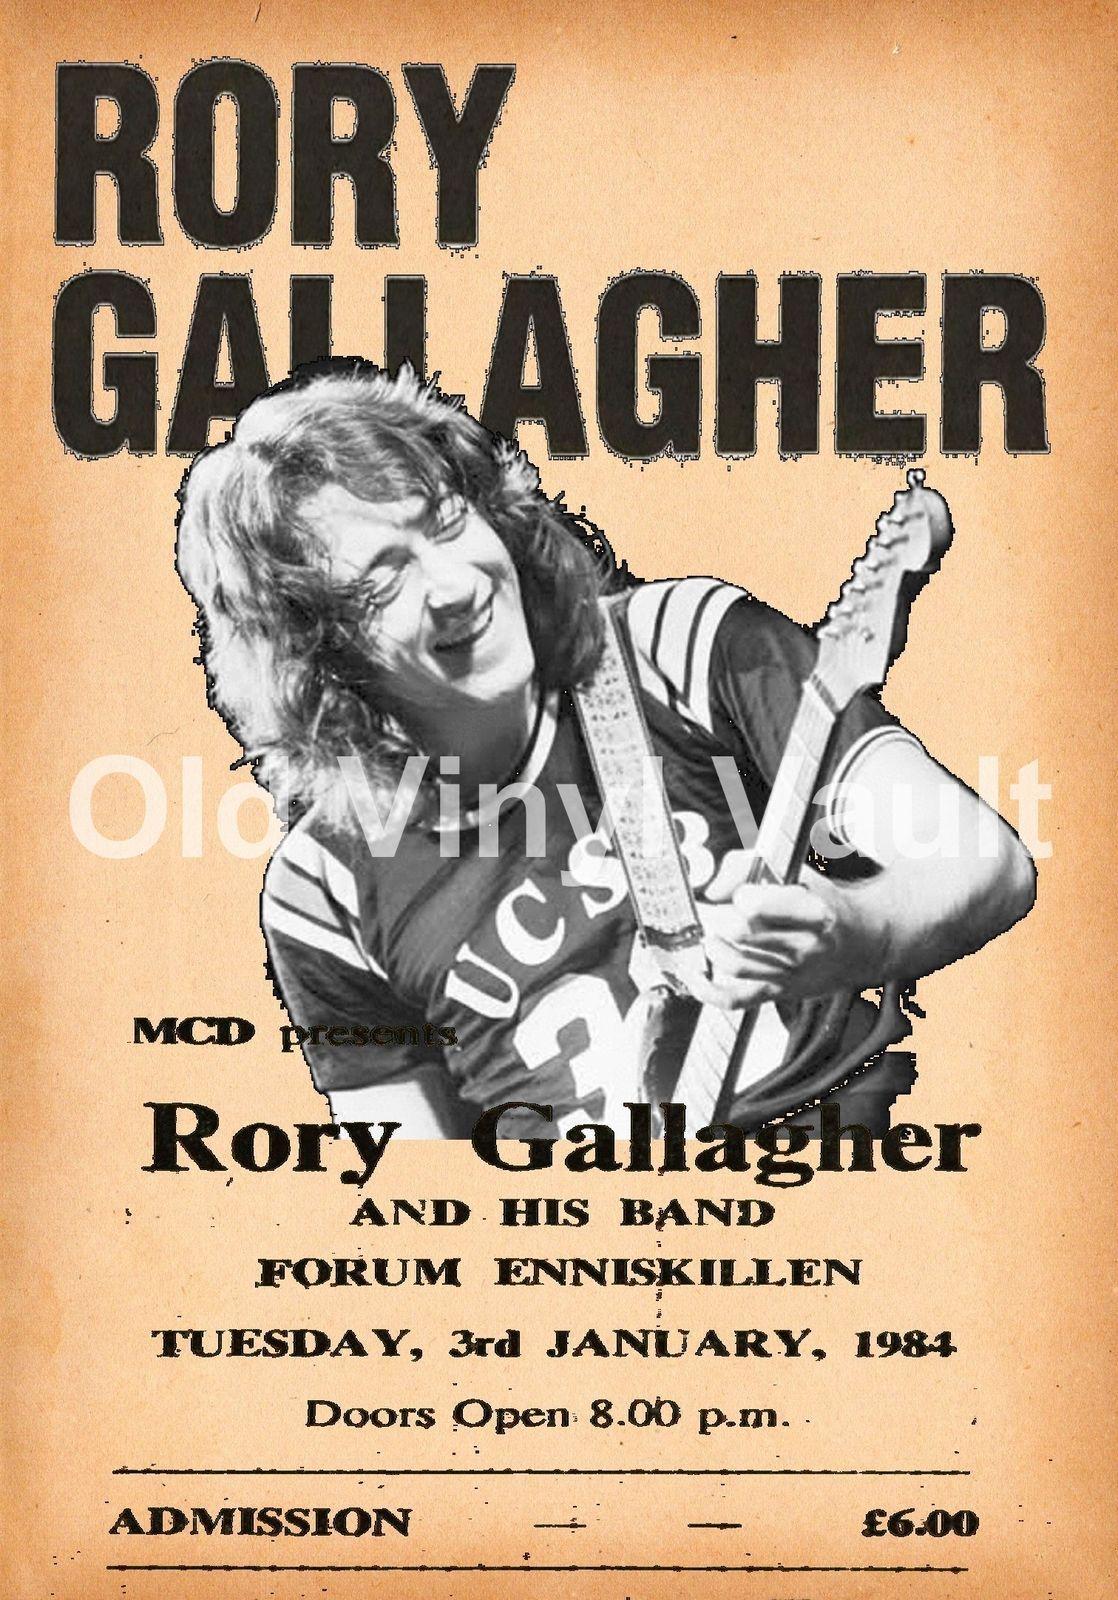 Rory Gallagher Concert Poster Enniskillen Forum 1984 New A3 Size